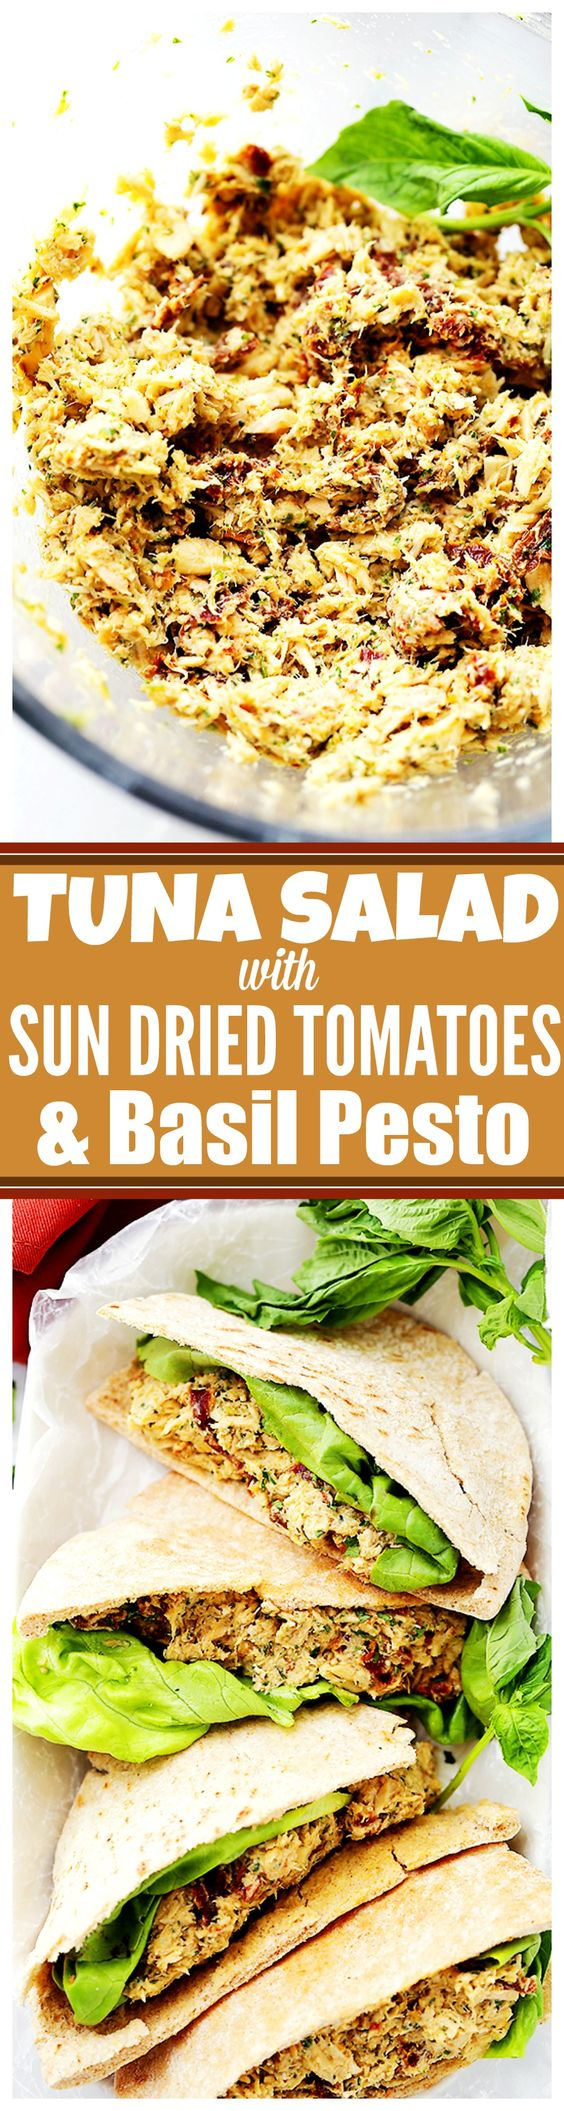 Sun Dried Tomatoes and Basil Pesto Tuna Salad – Combined with ...